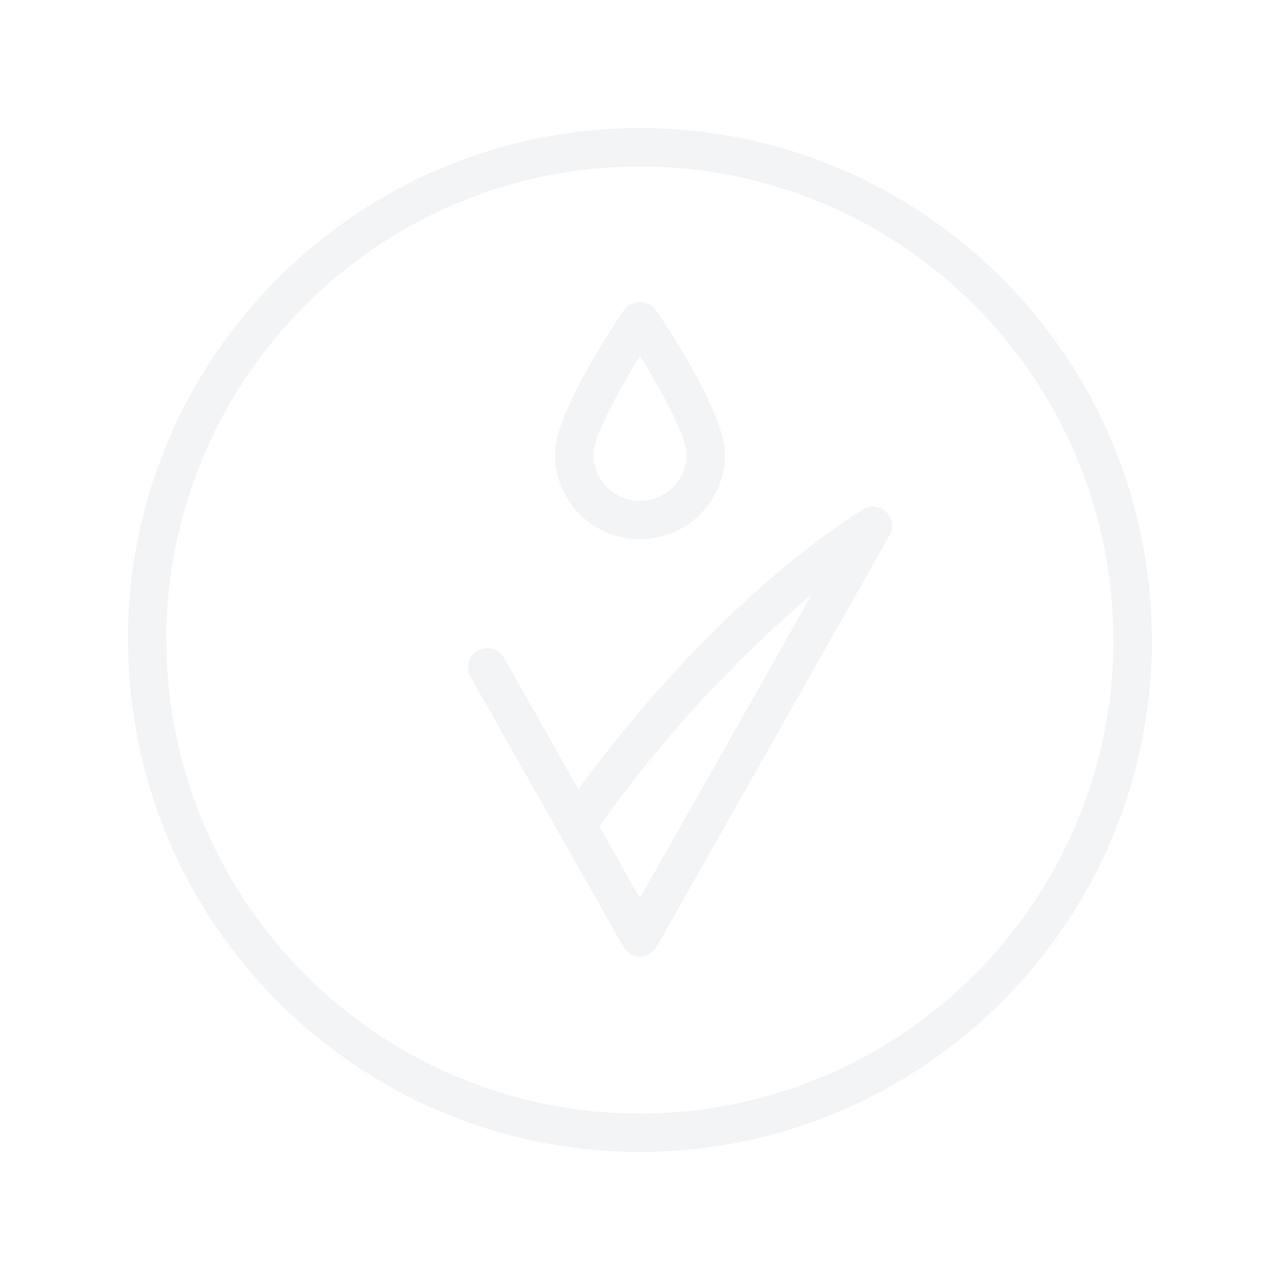 Clarins Men Line-Control Eye Balm 20ml